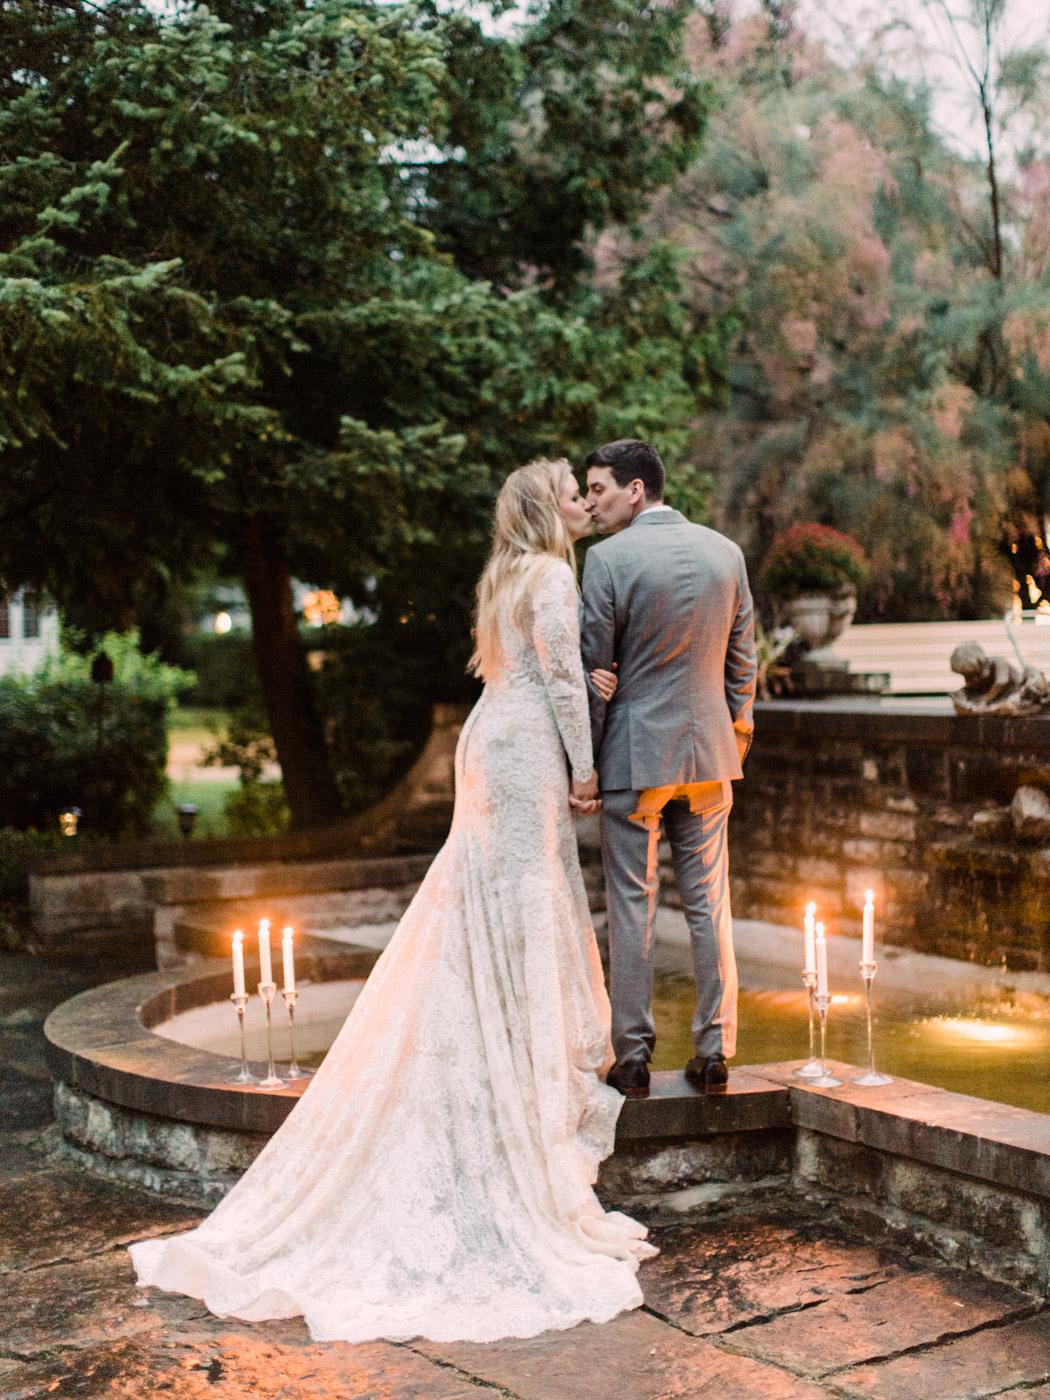 Toronto-wedding-photographer-intimate-classic-fine-art-elopement-ottawa96.jpg